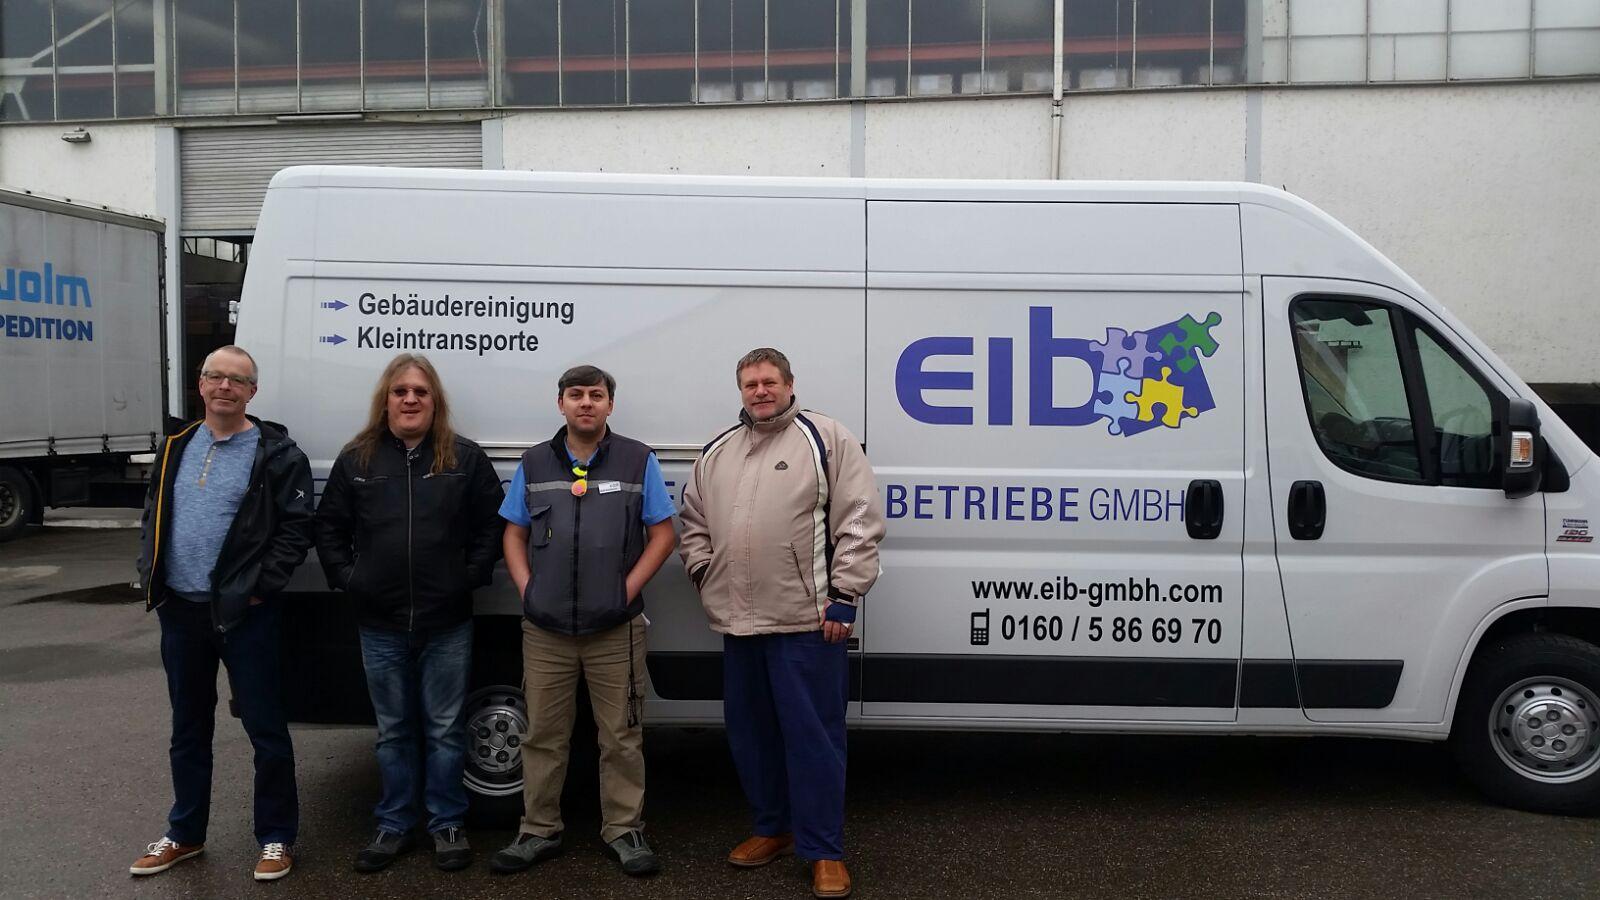 neues Fahrzeug für EIB